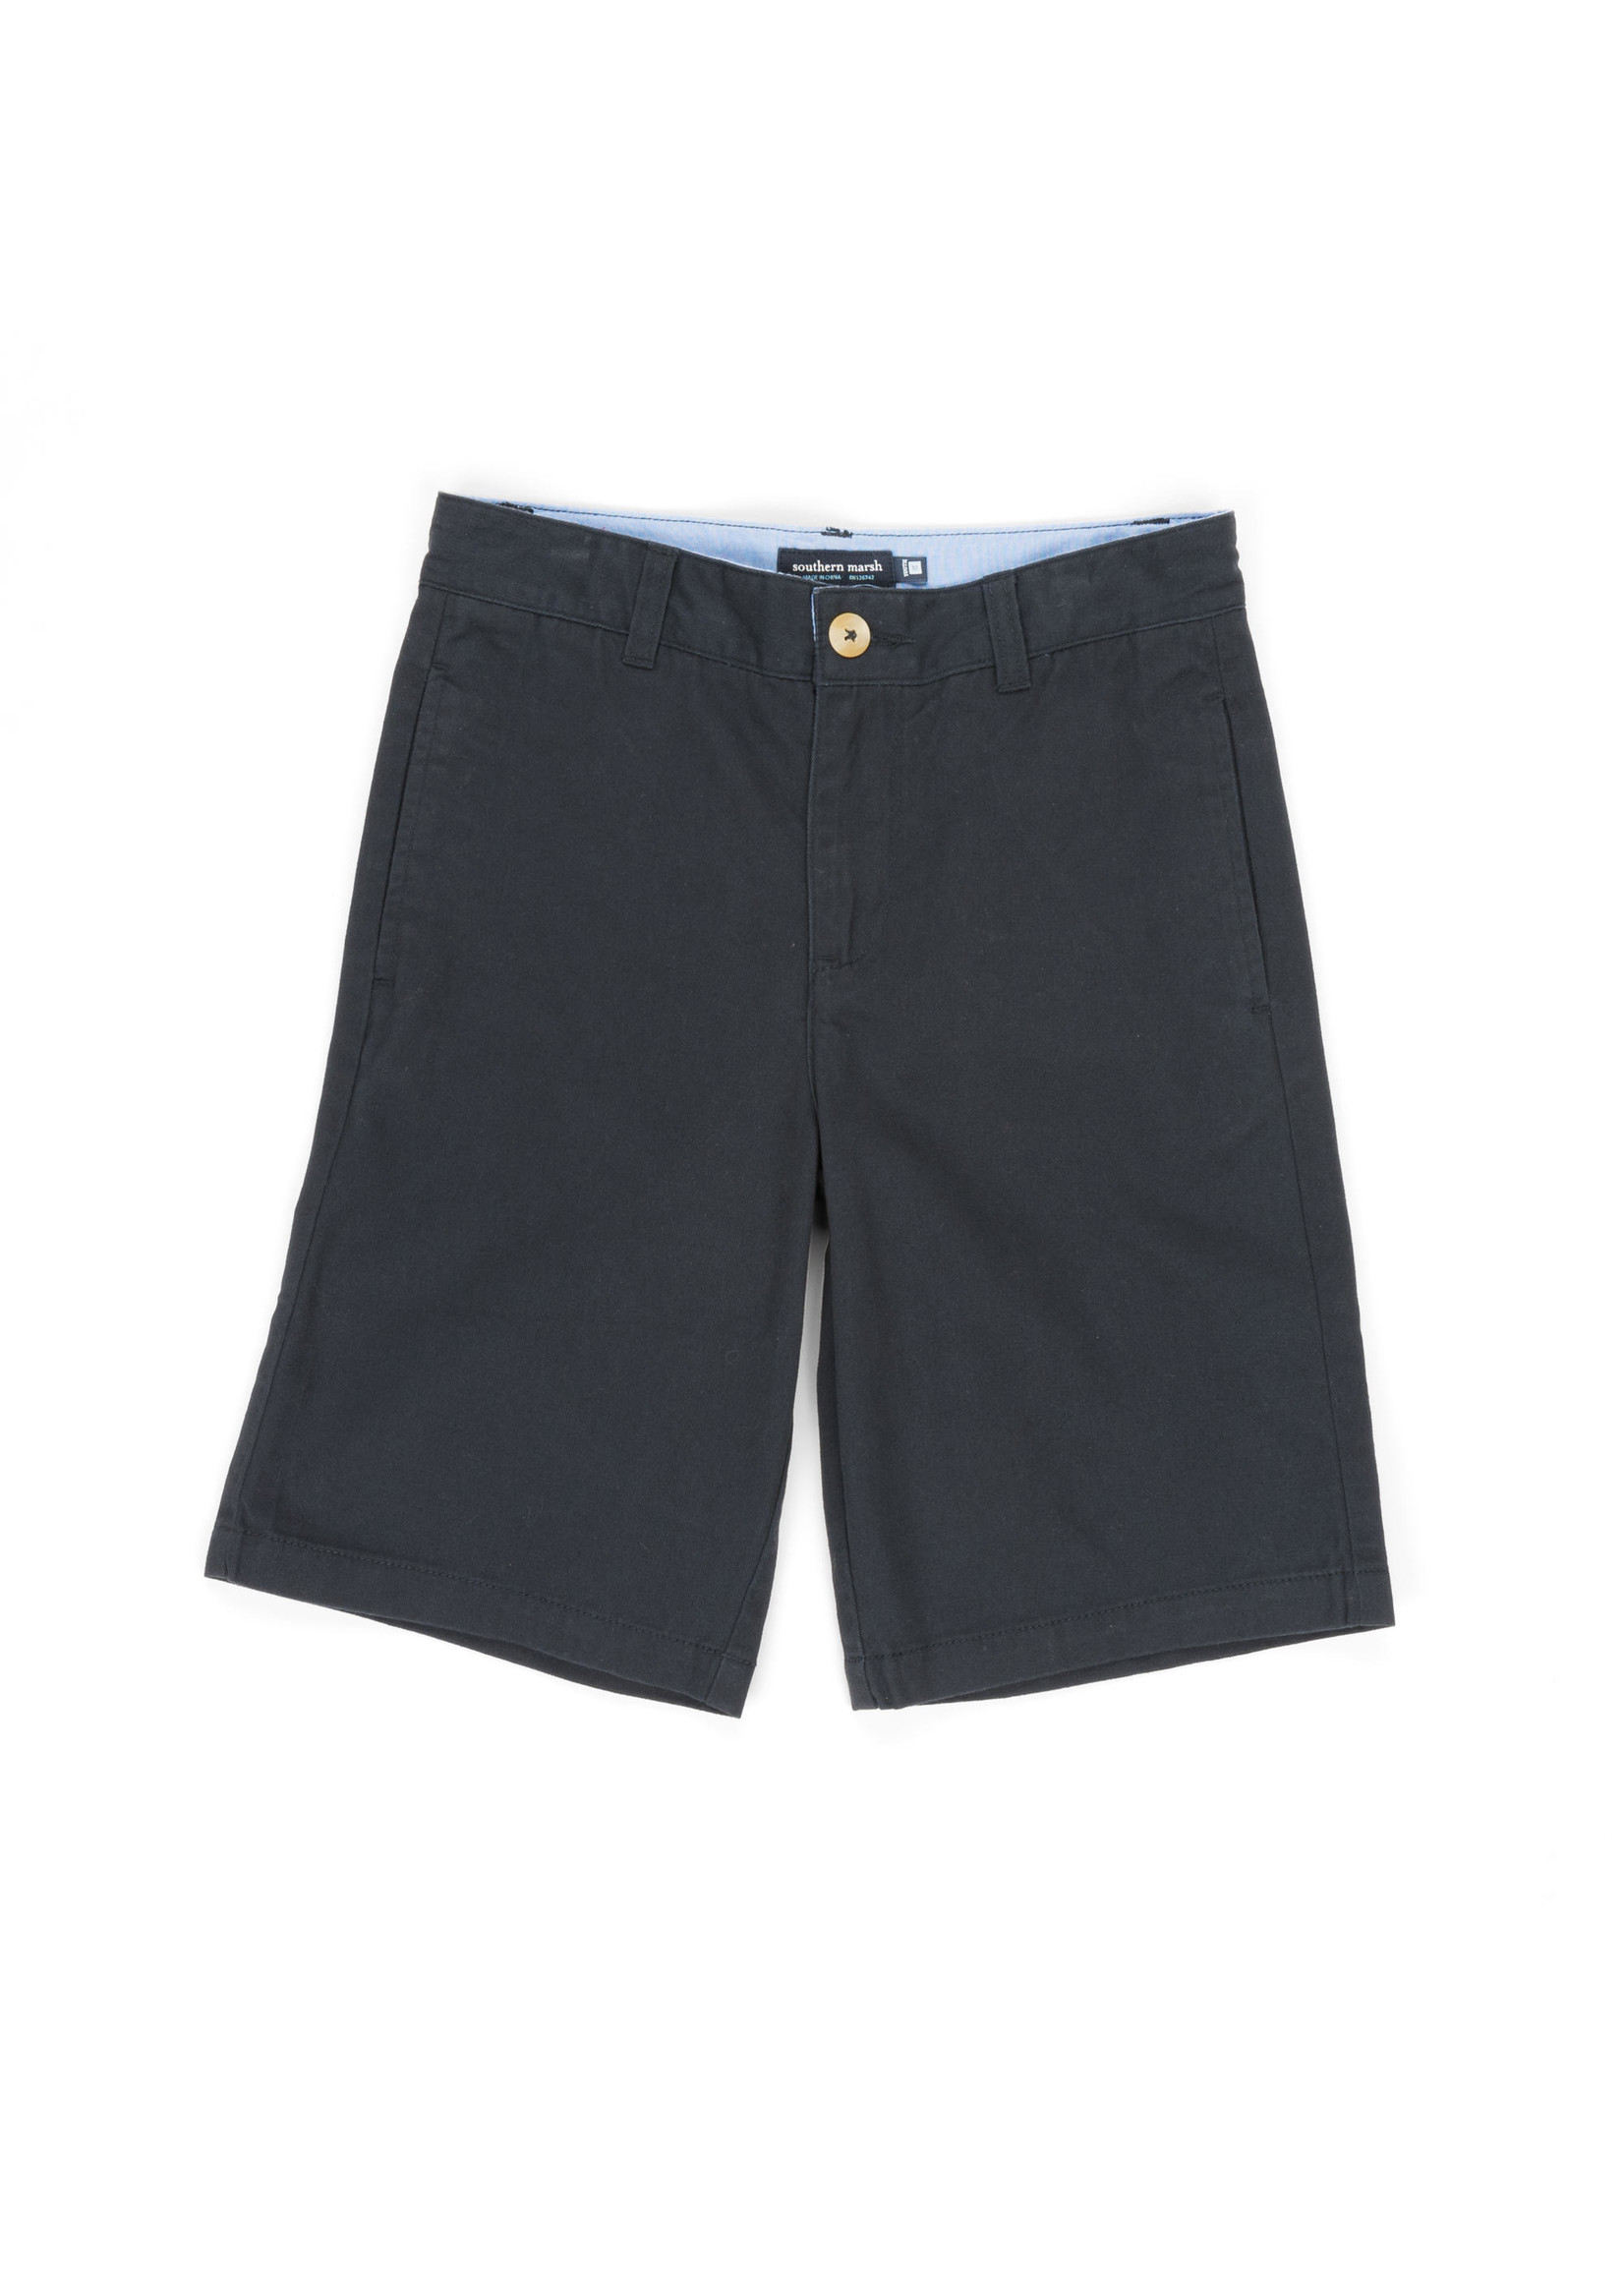 Southern Marsh Youth Regatta Shorts